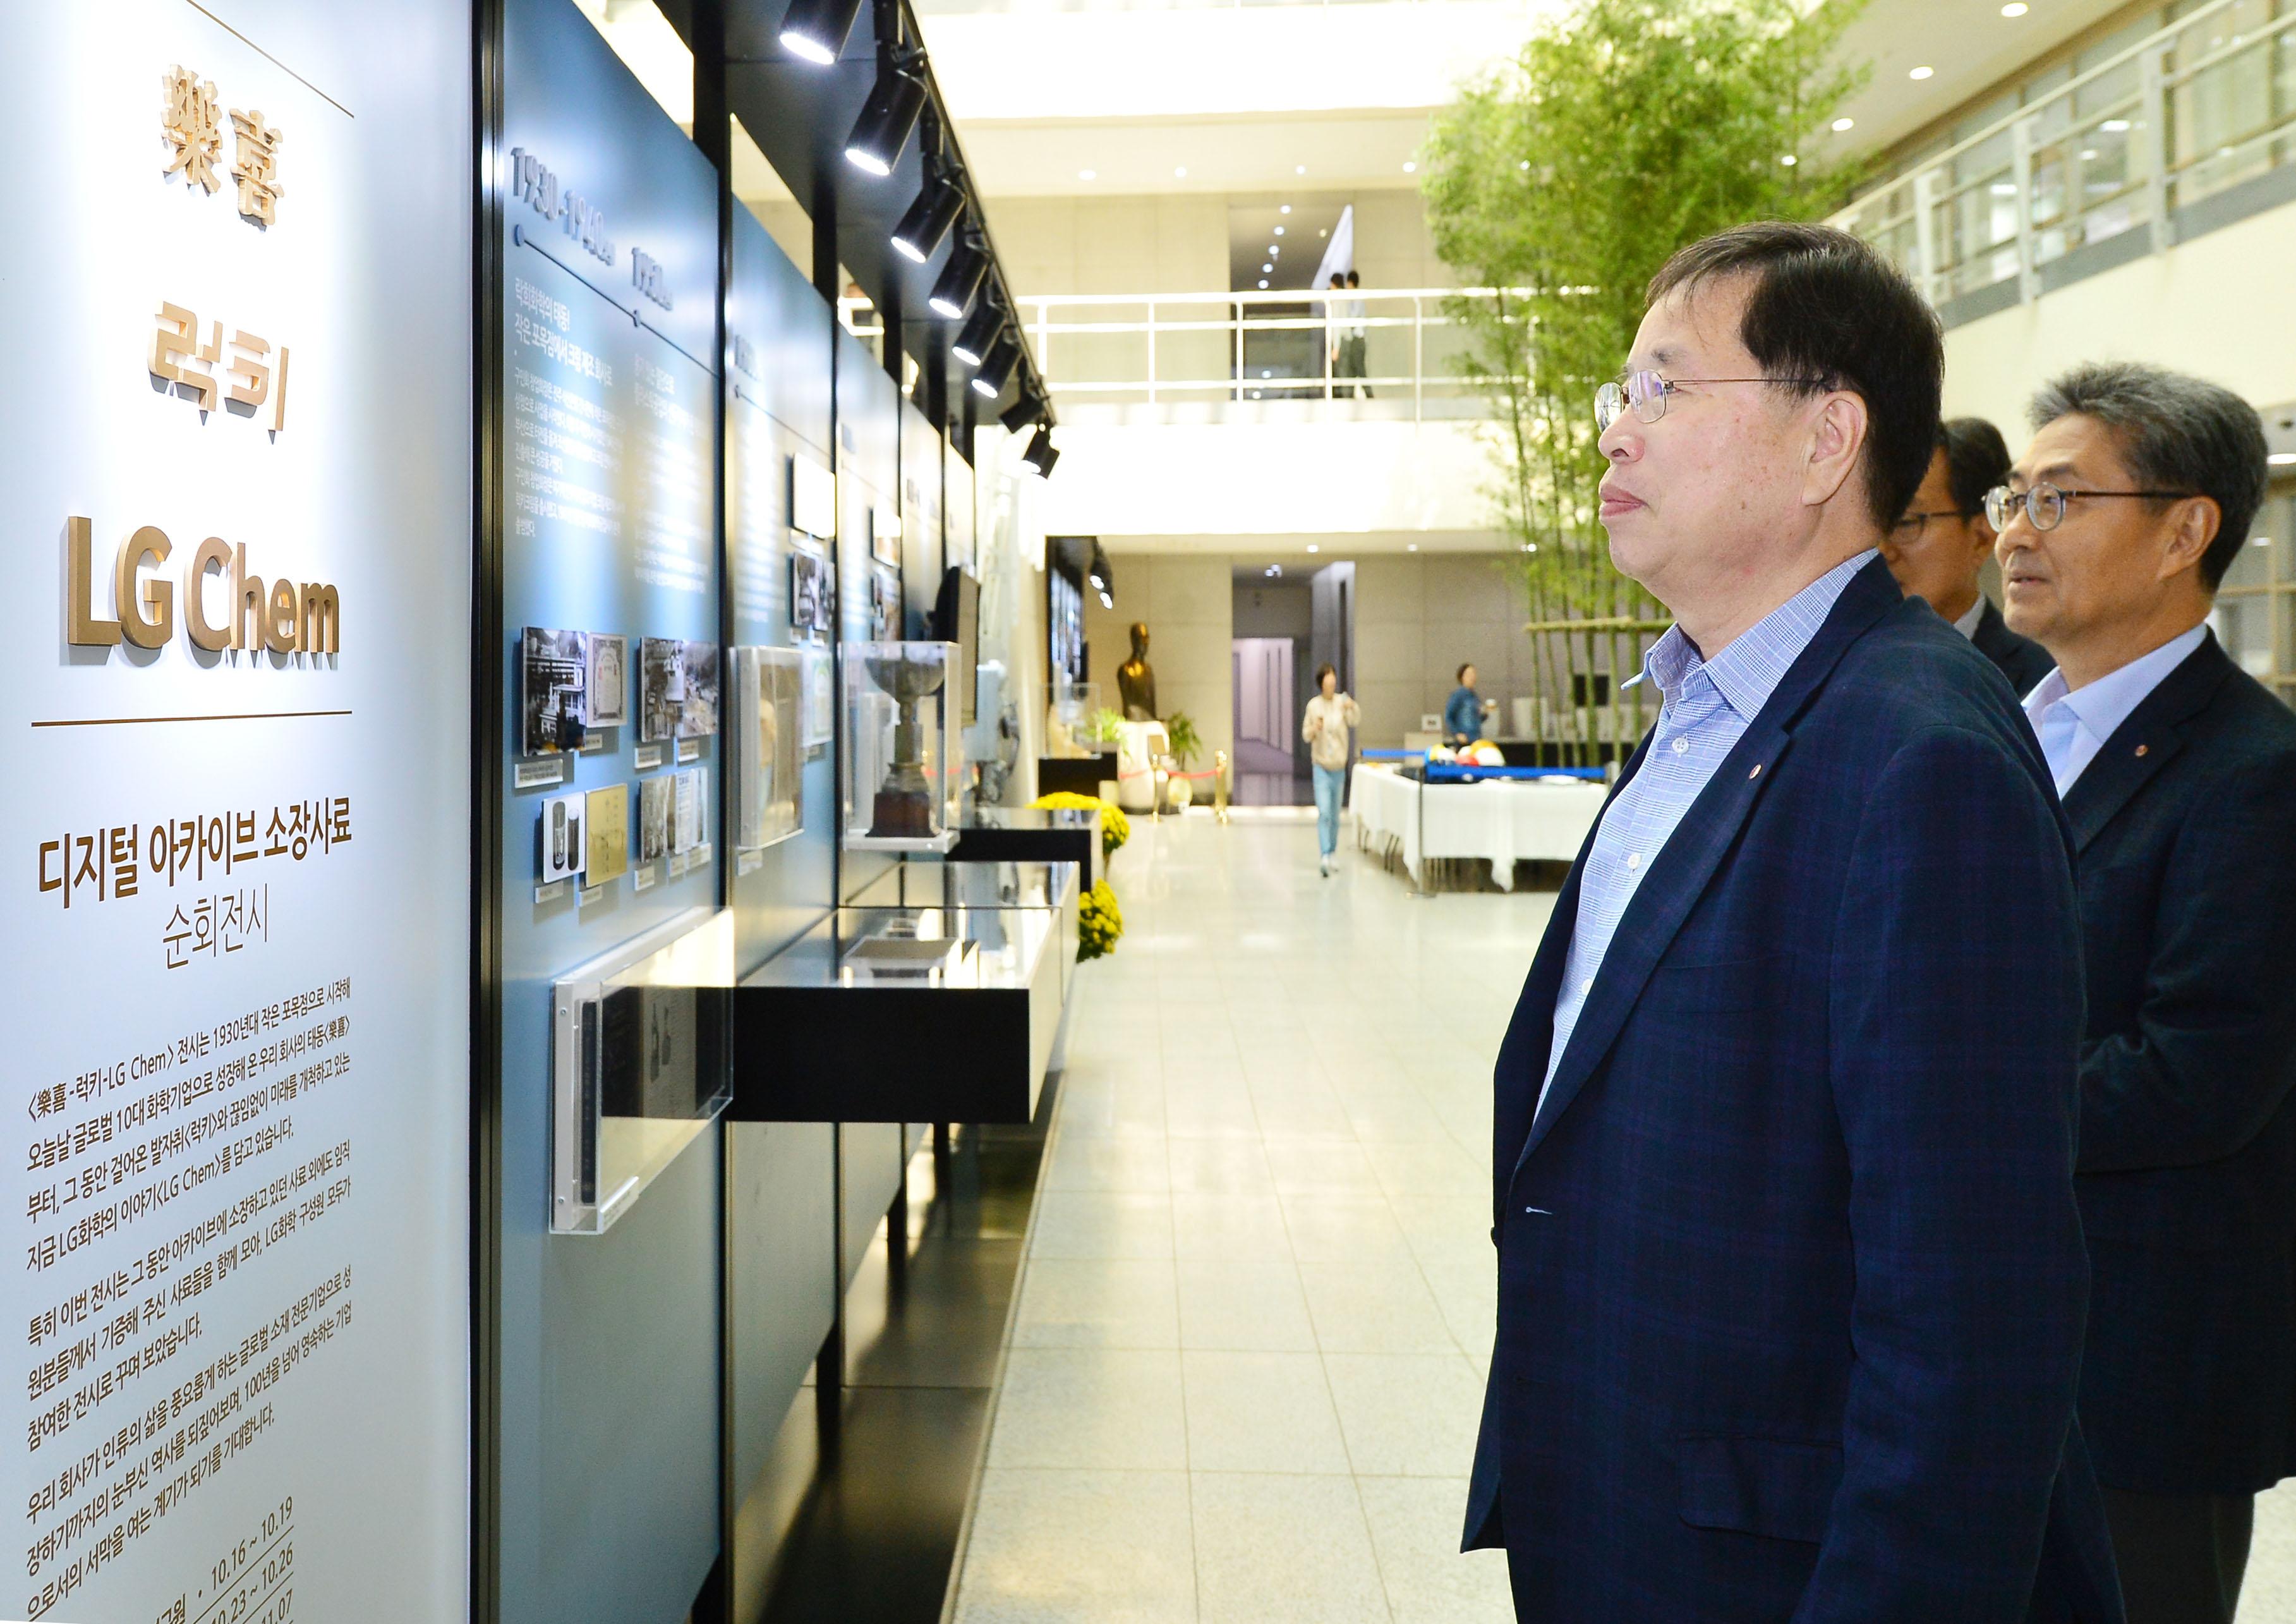 LG화학 박진수 부회장(사진 맨 앞)이 사내 역사자료 전시회가 열린 대전 기술연구원을 찾아 전시 소개를 읽고 있다.